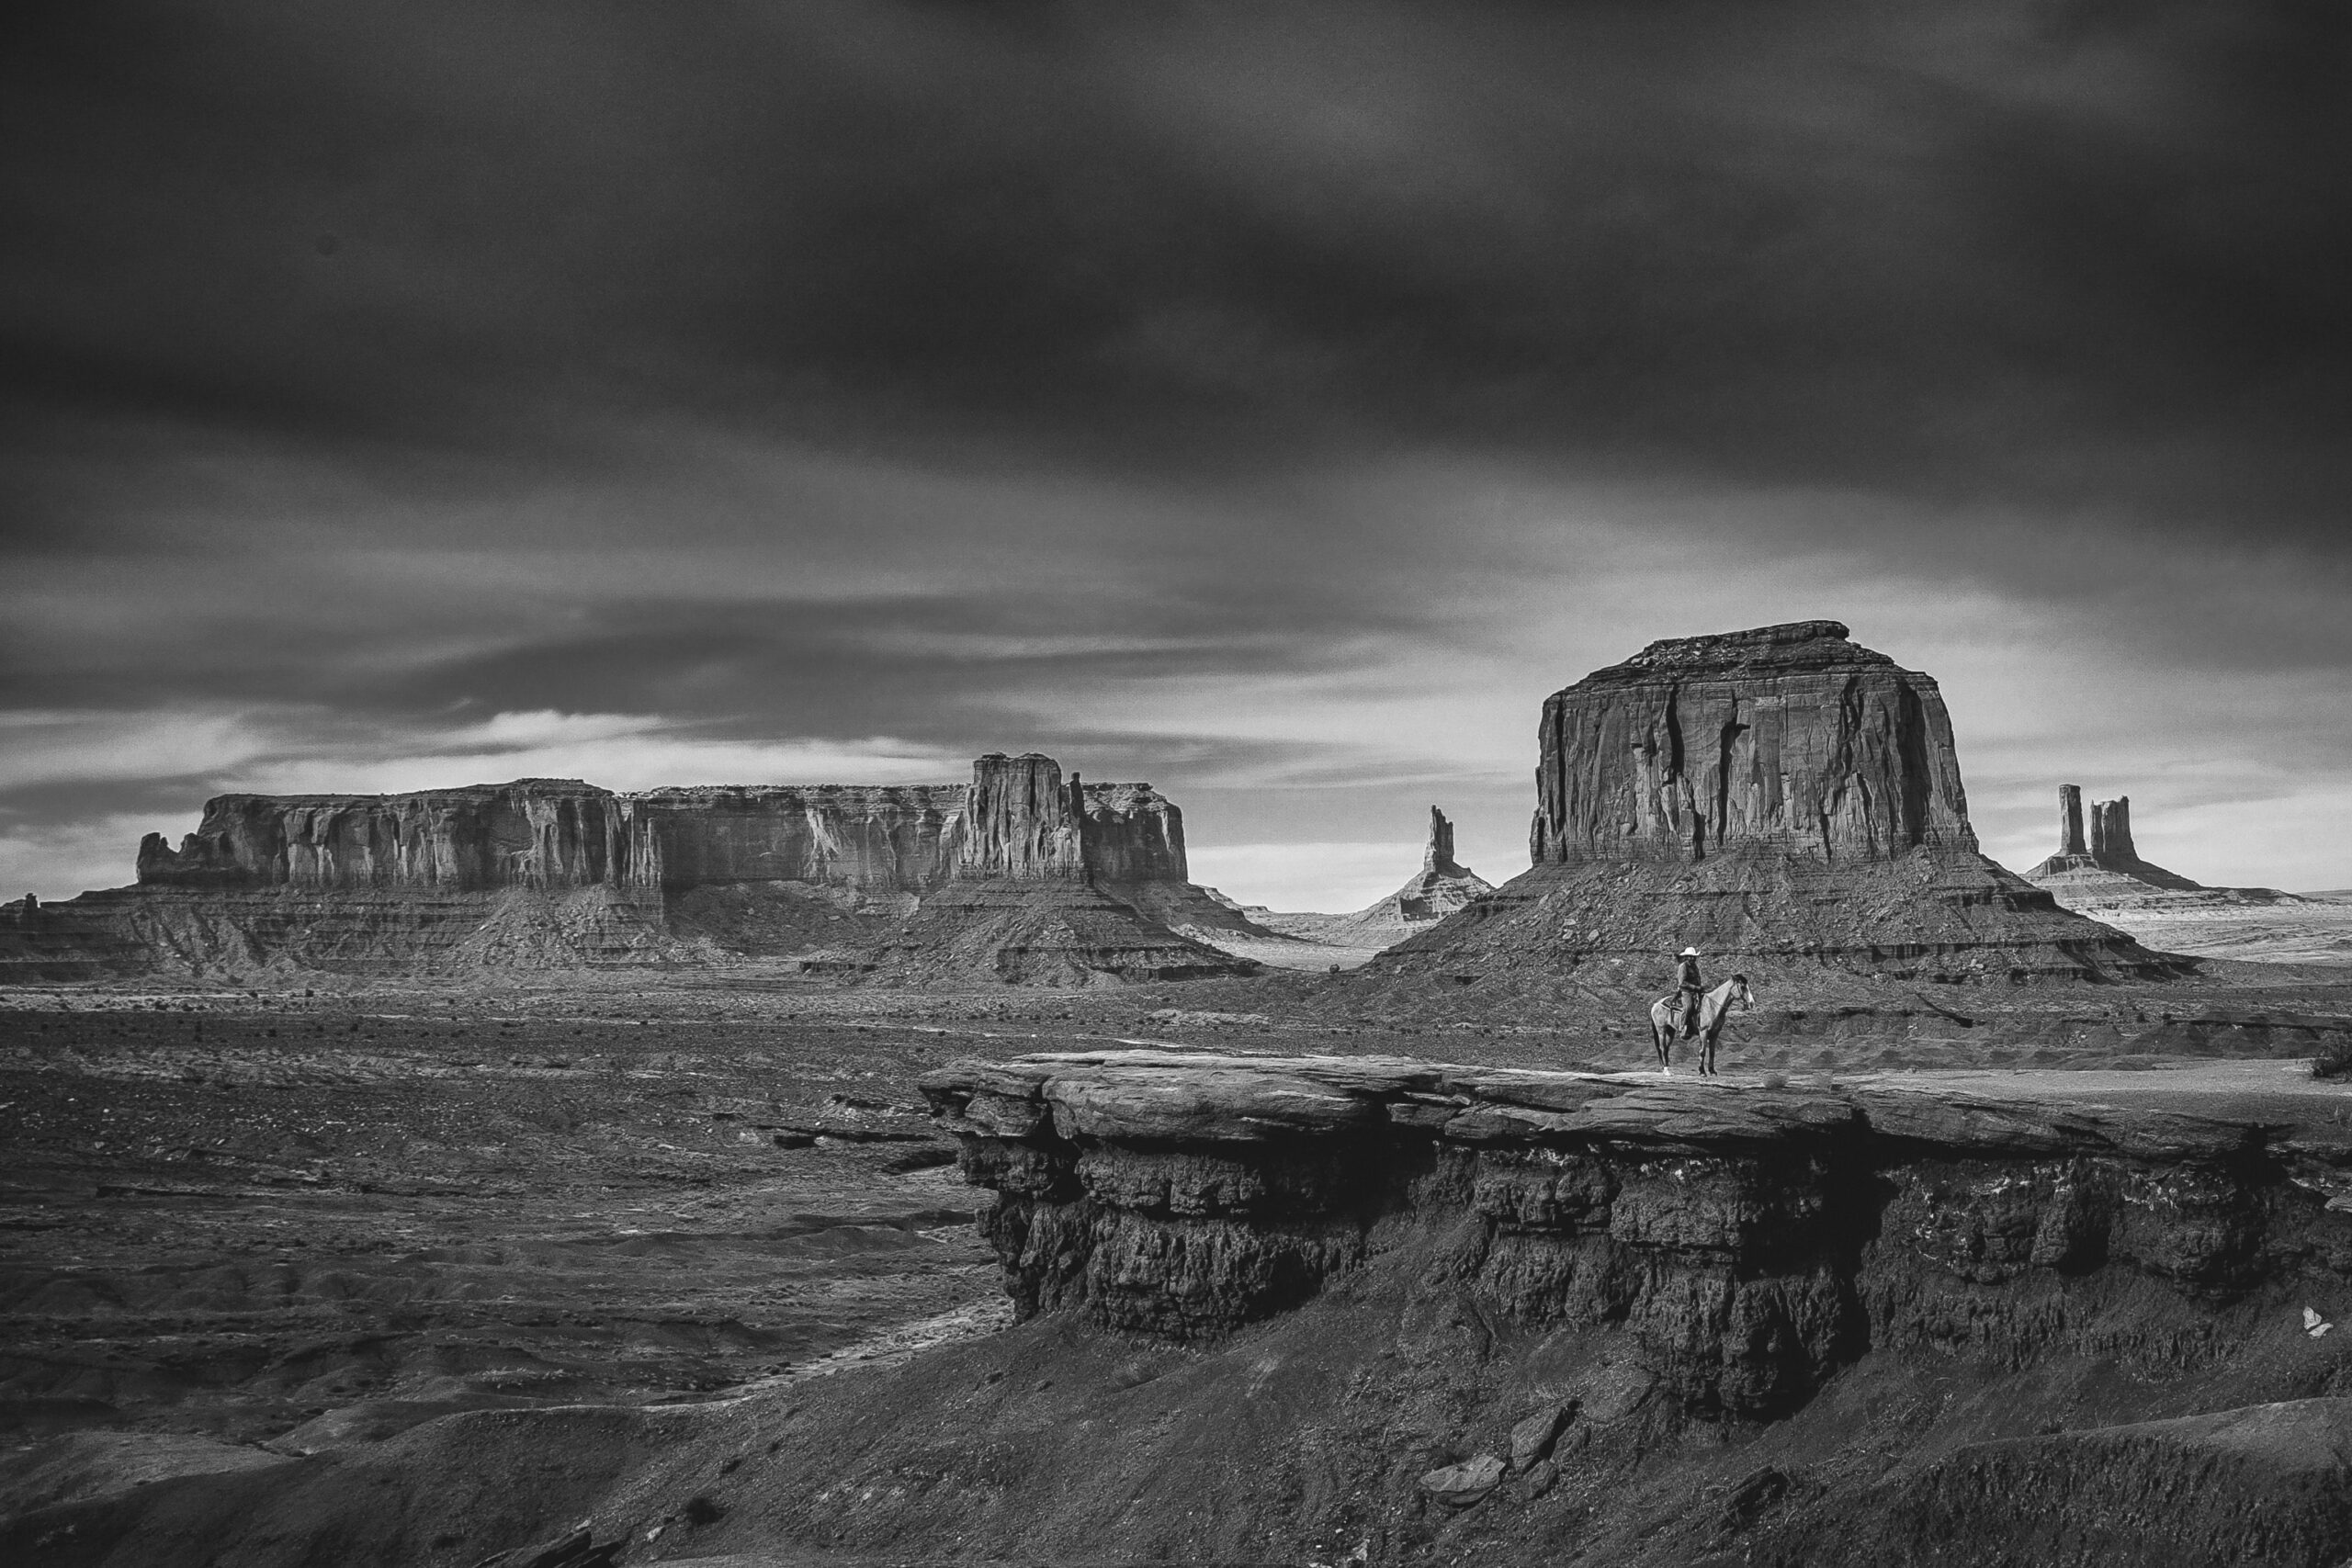 ashim-d-silva-cowboy rancher Western Skies-unsplash